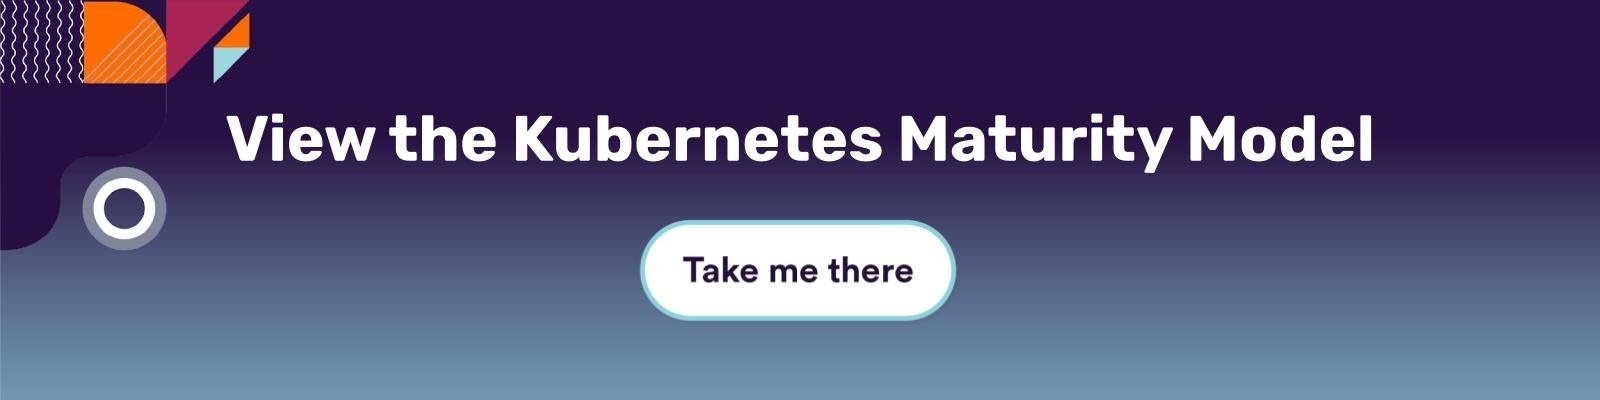 View the Kubernetes Maturity Model